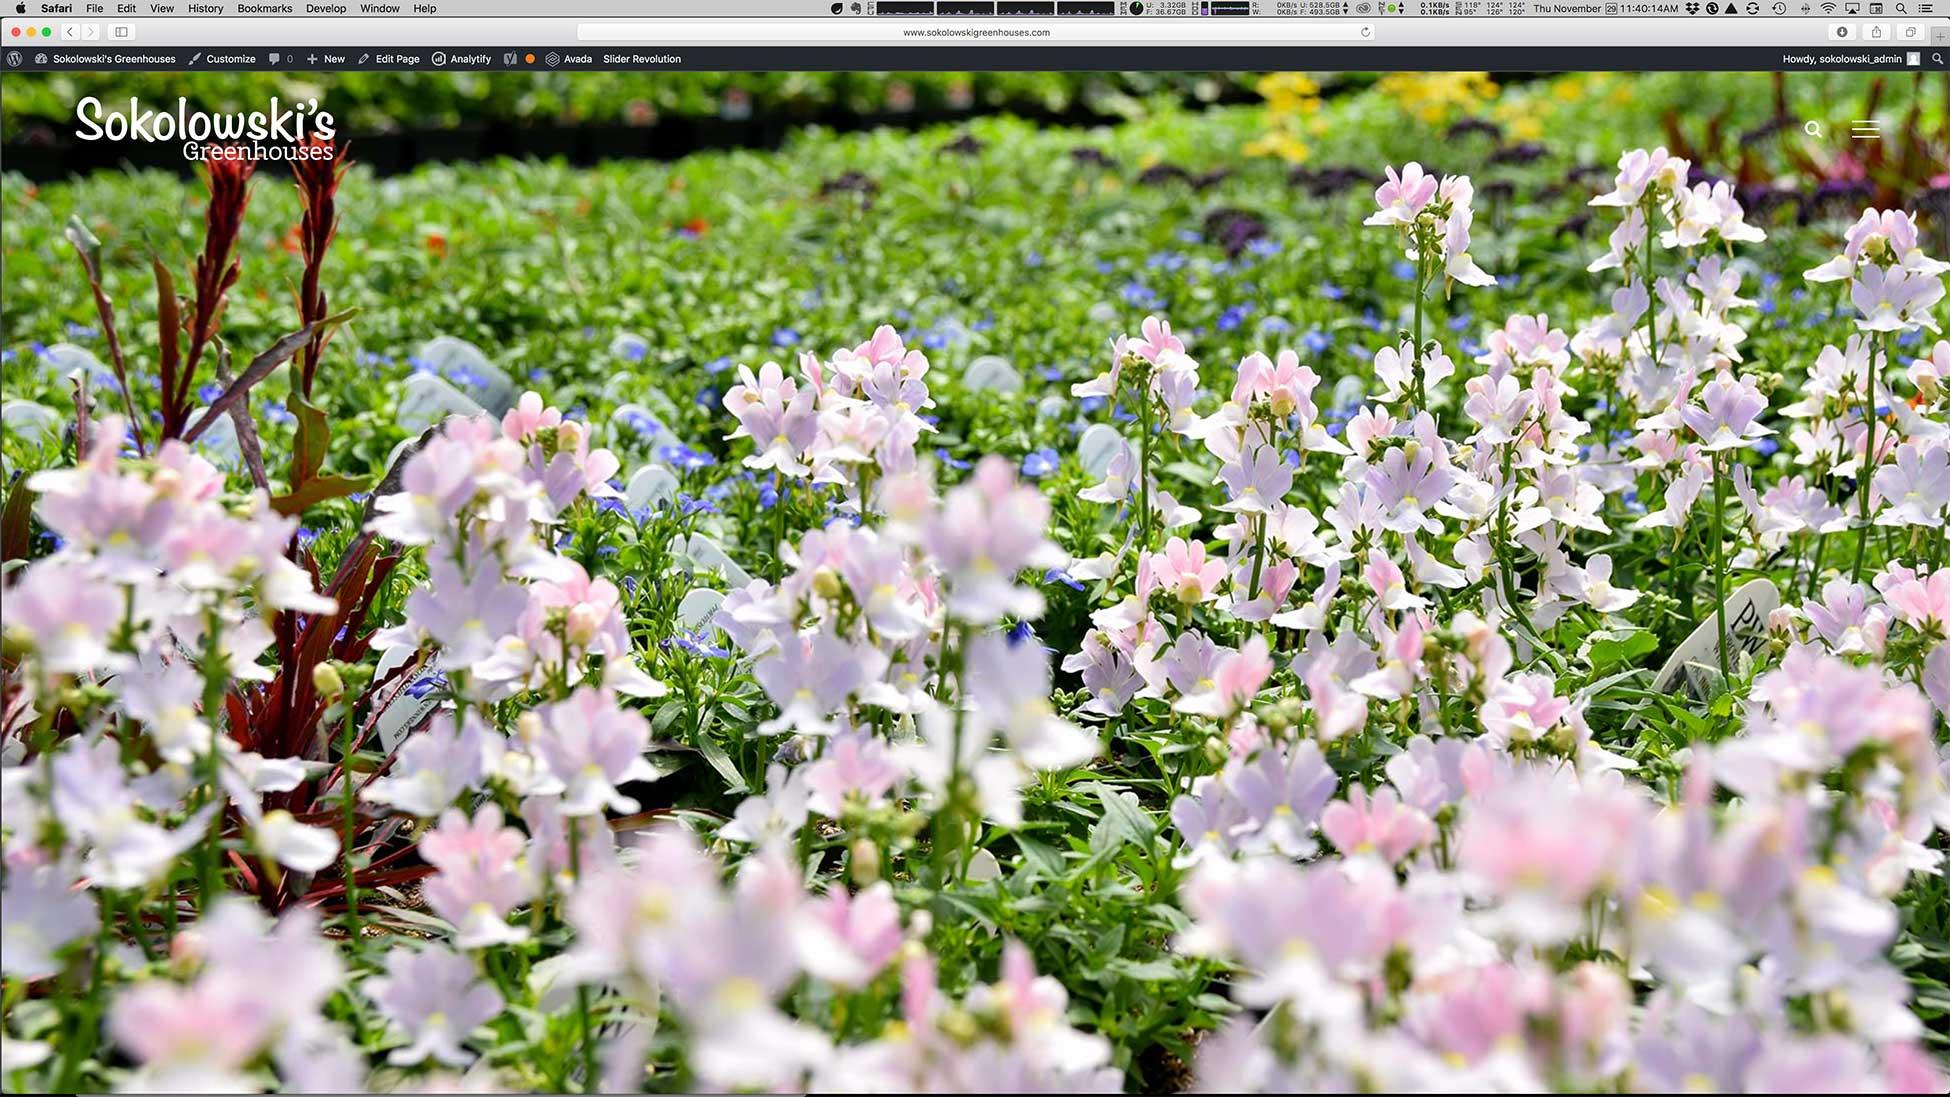 Image of Sokolowski's Greenhouses website homepage.